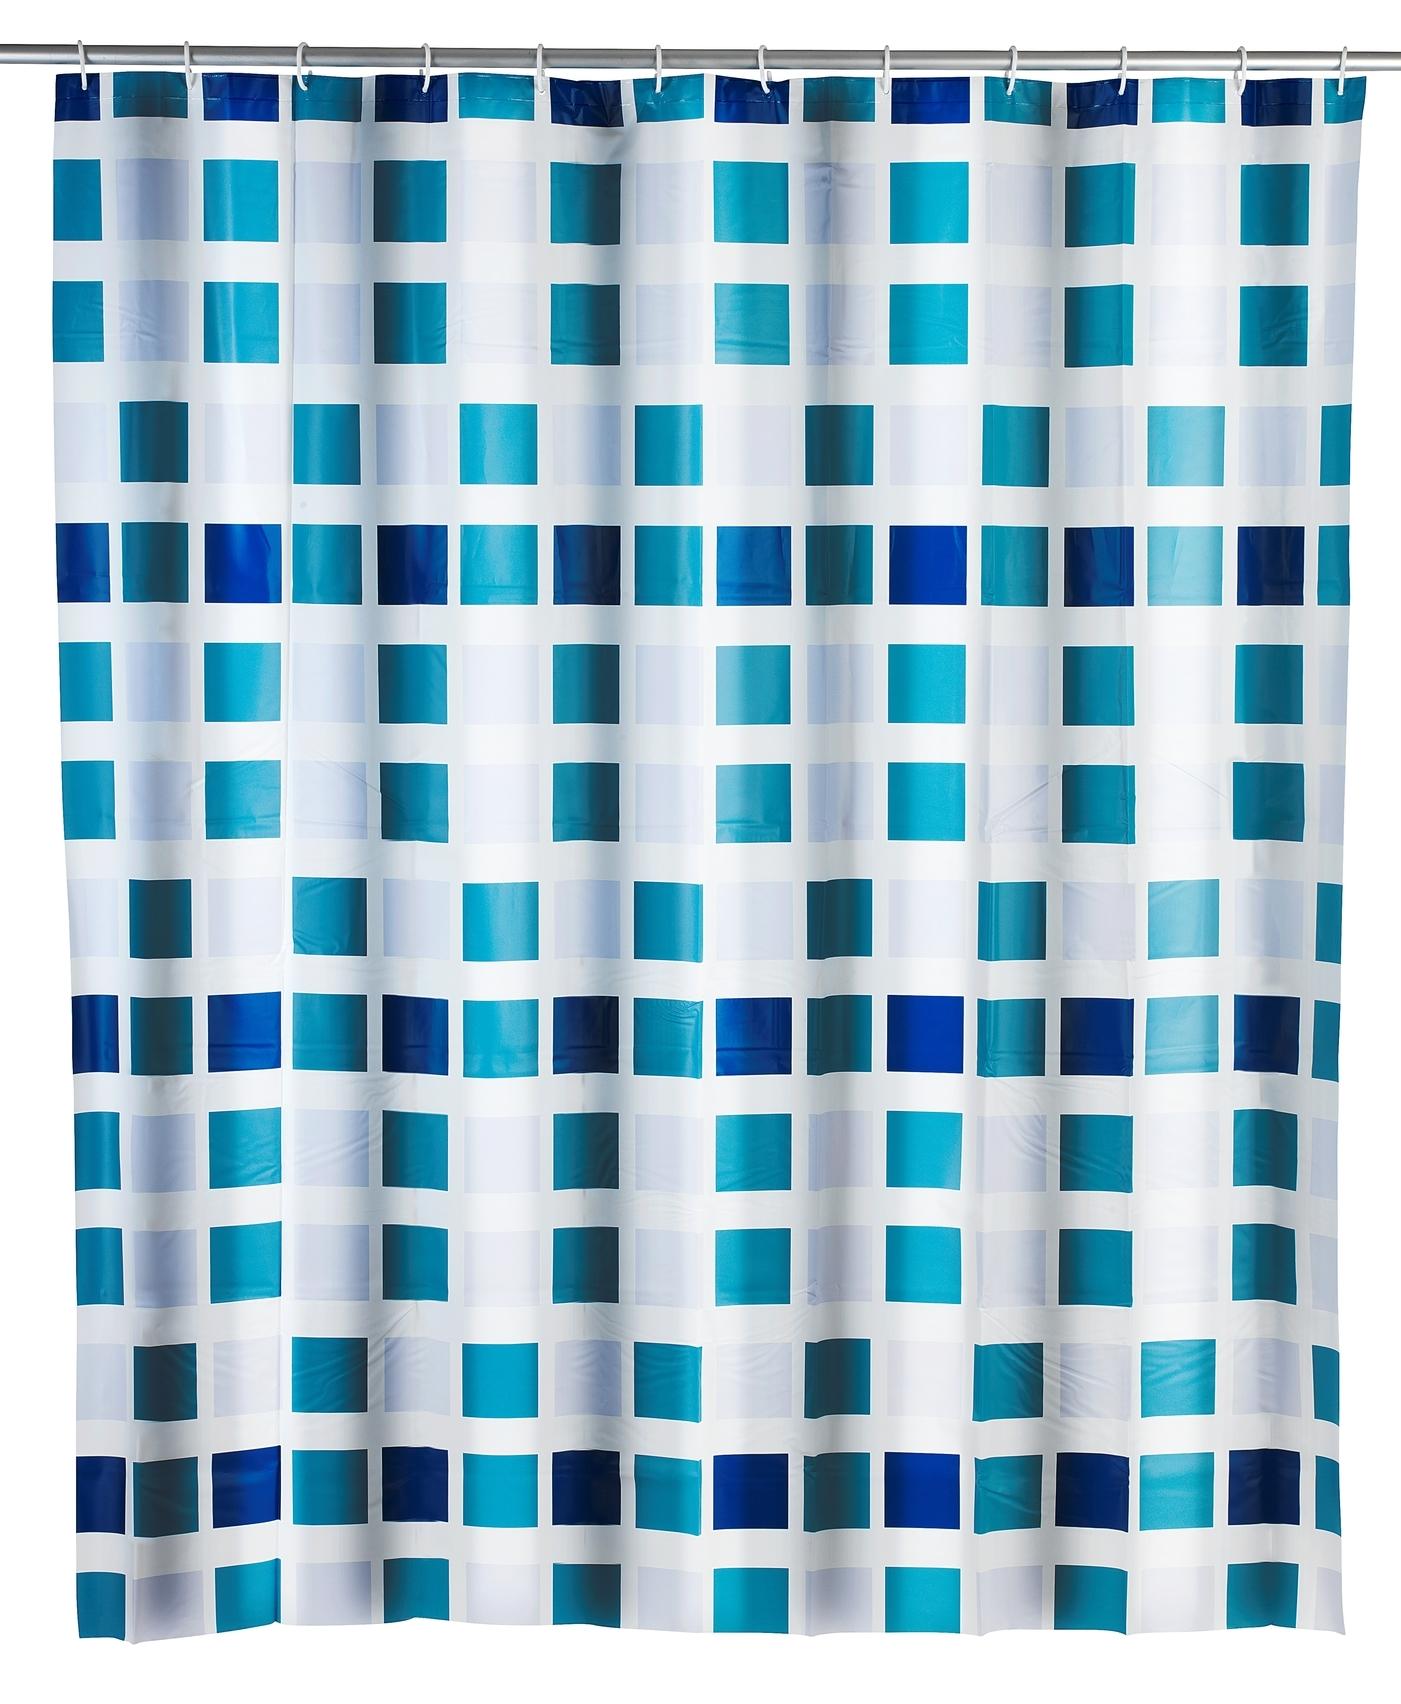 Perdea dus din PEVA, Mosaic Multicolor, 180 x 200 cm imagine